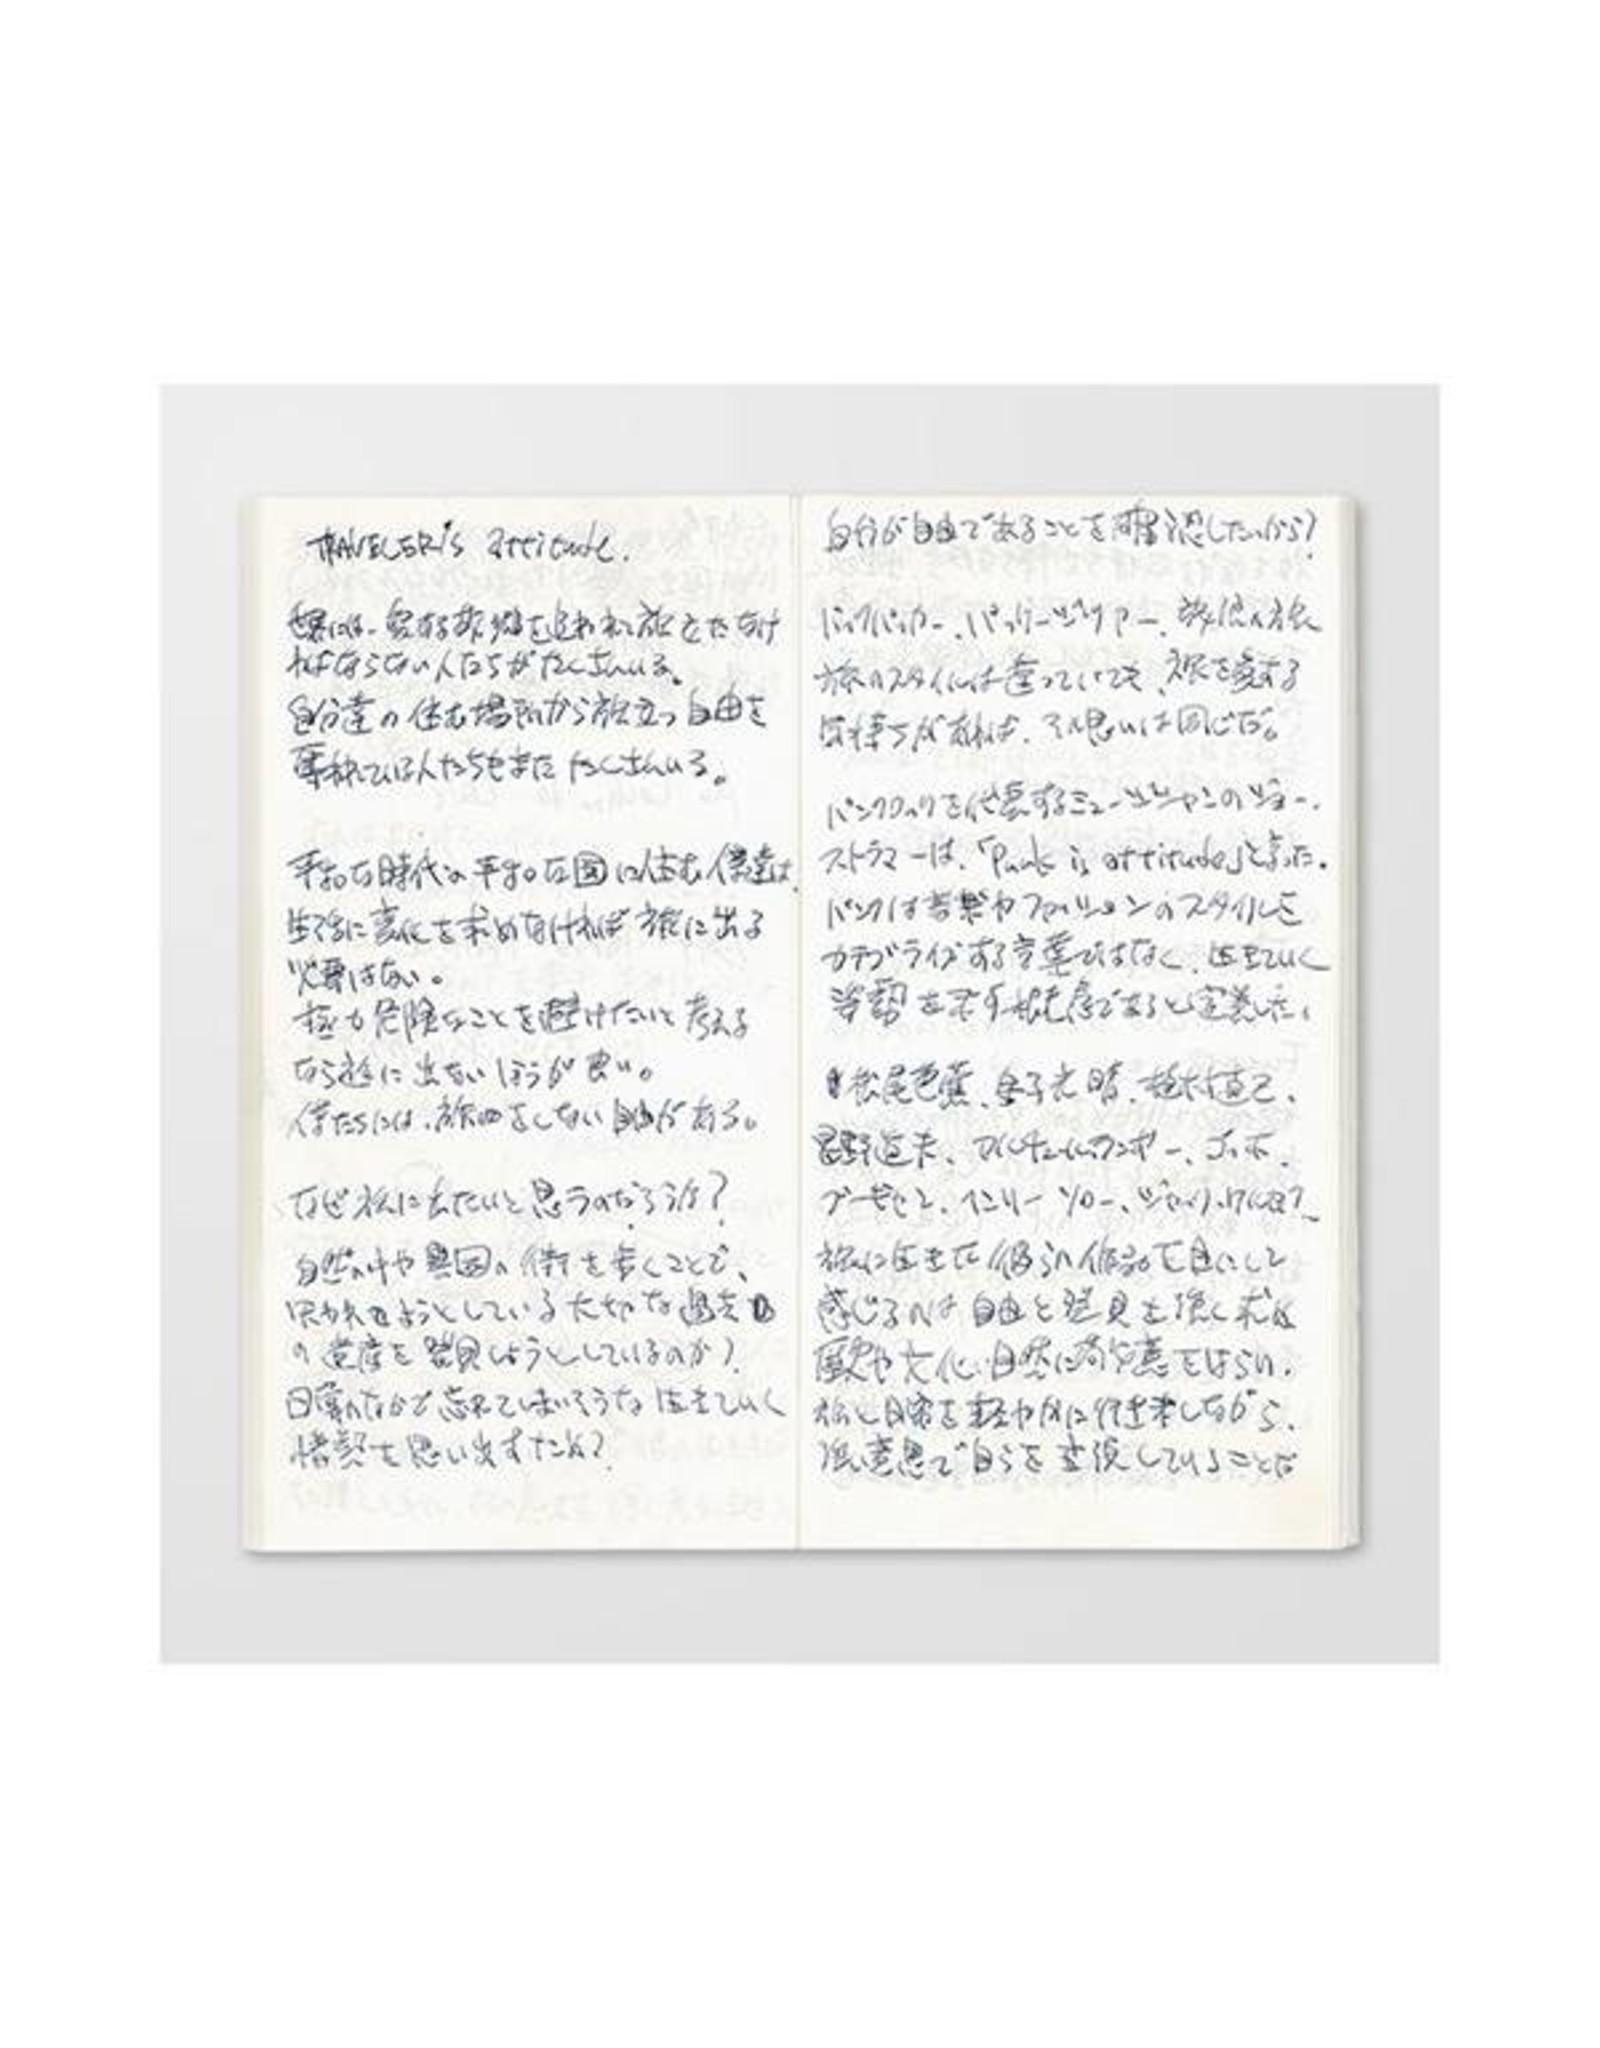 Traveler's Company 013. LIGHT WEIGHT PAPER (128PG) MIDORI TRAVELER'S NOTEBOOK